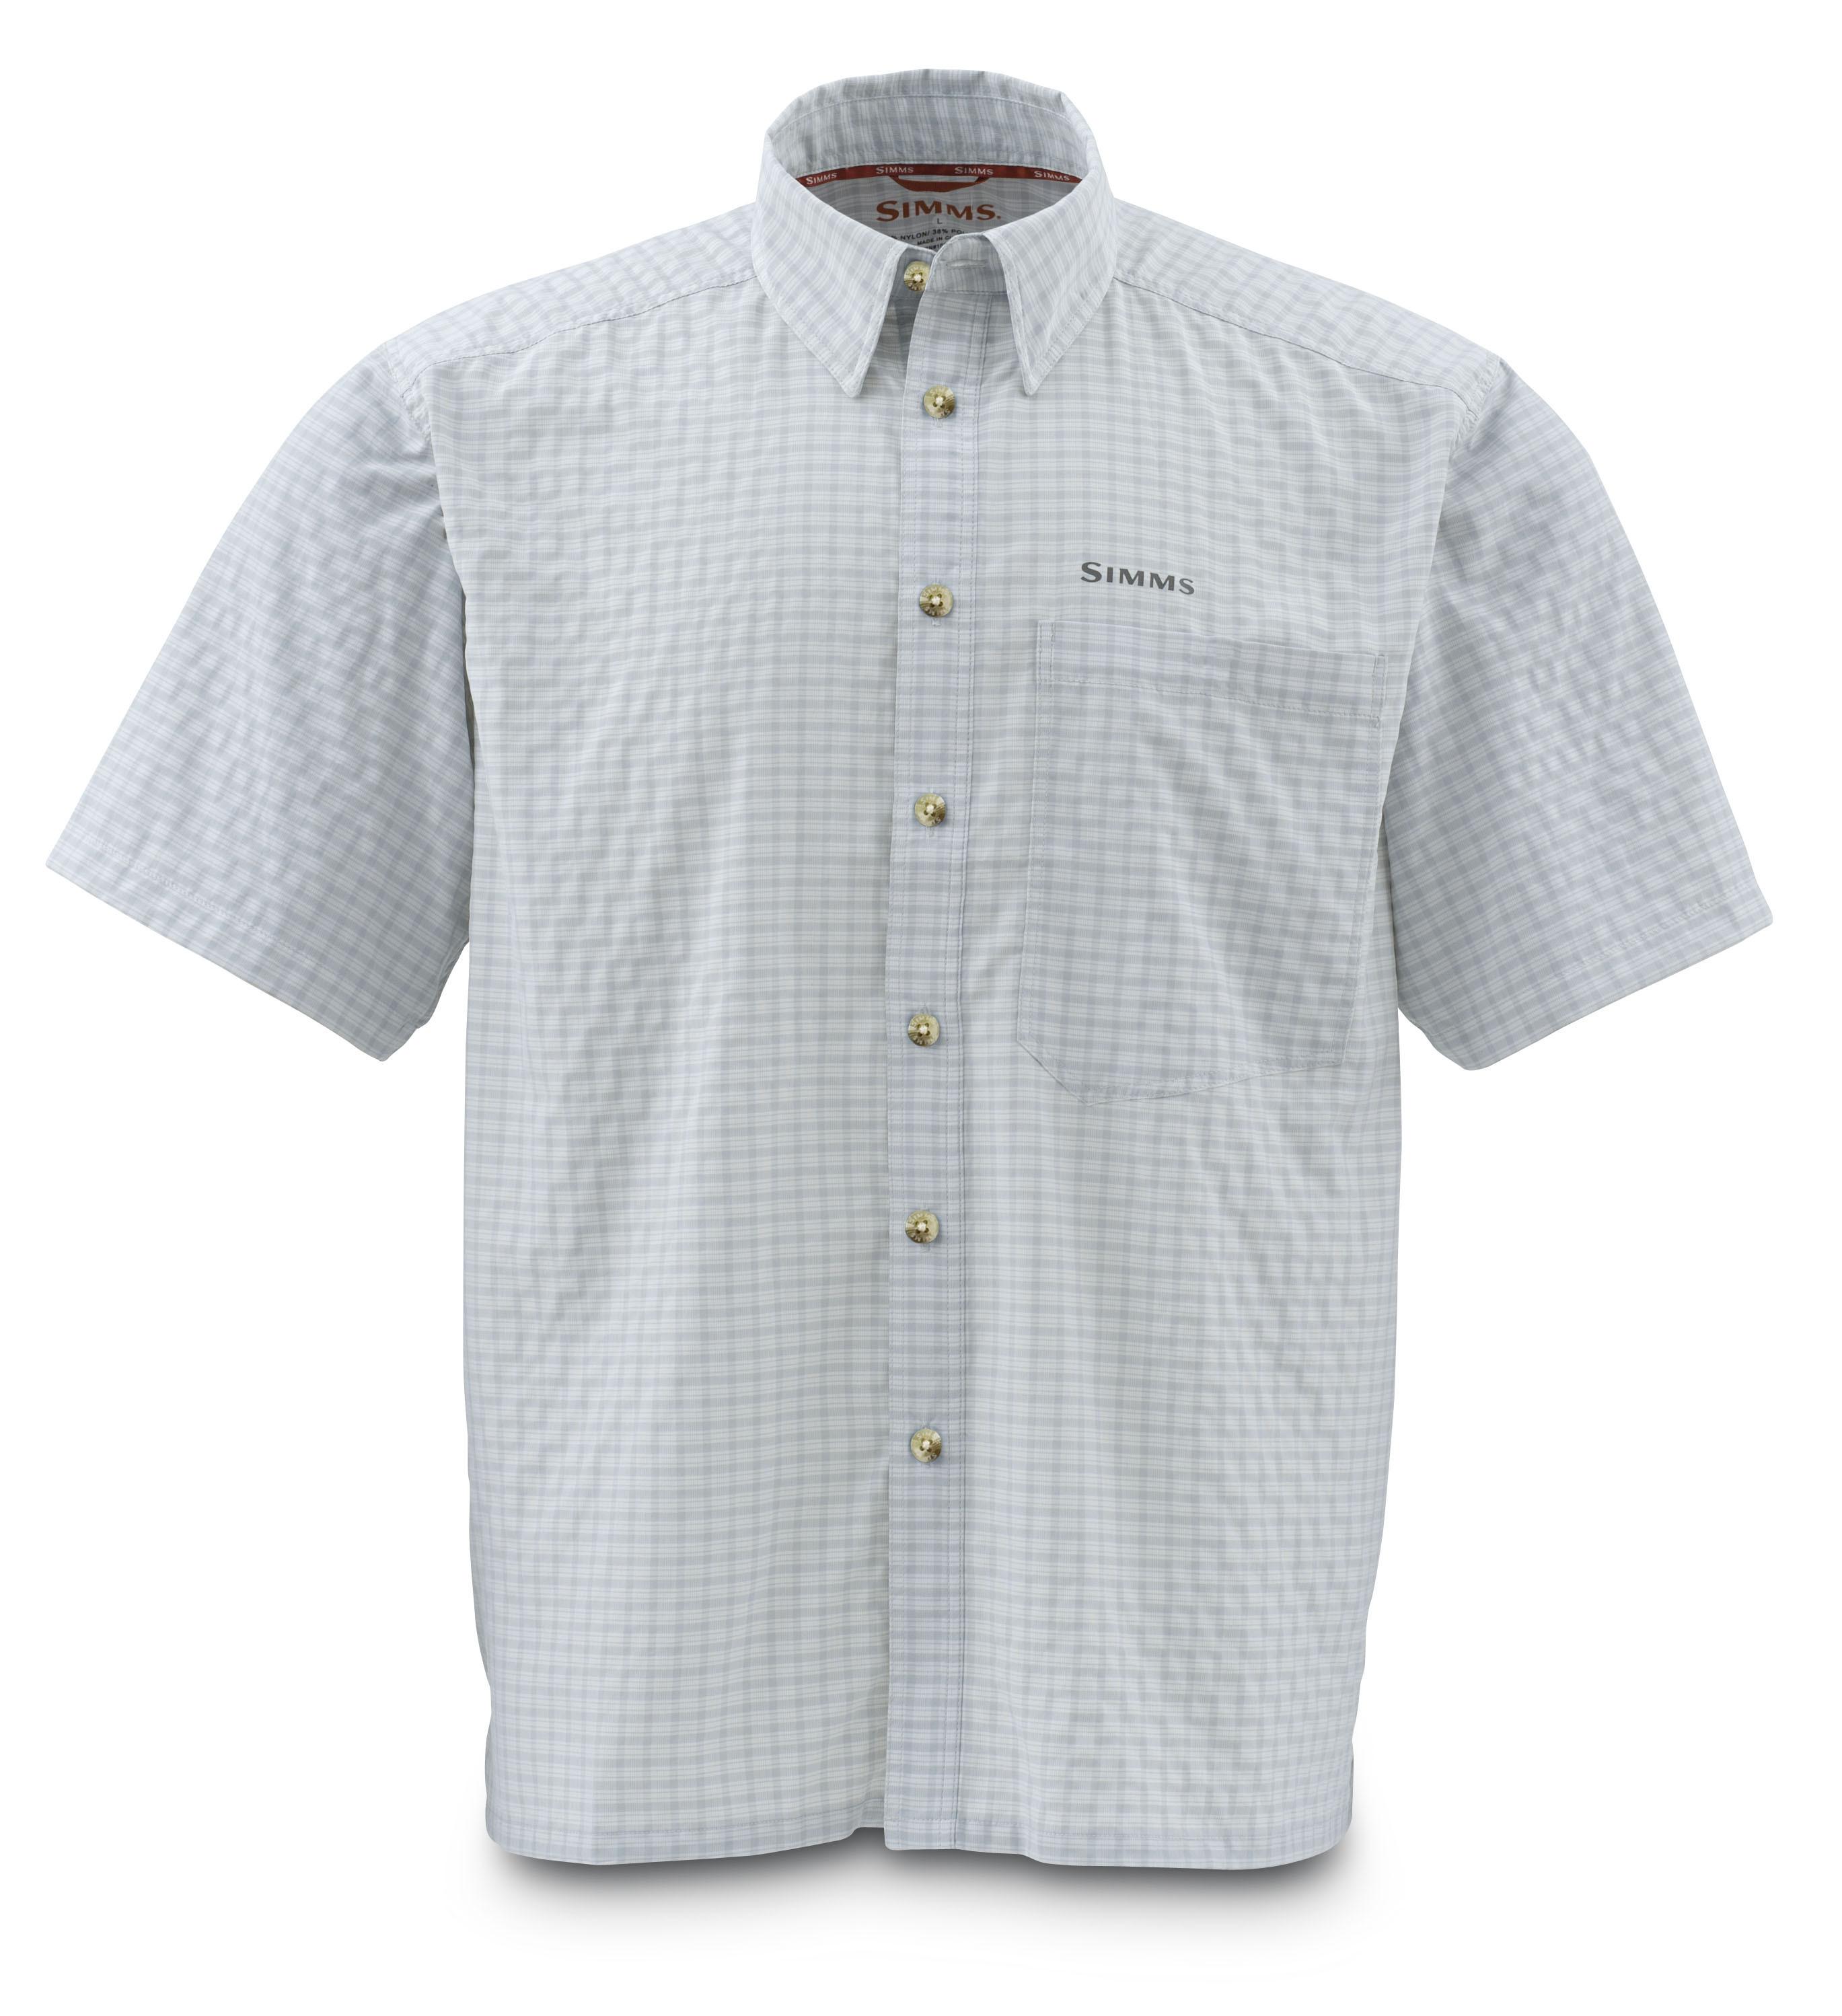 Simms morada shirt glasgow angling centre for Simms fishing shirts